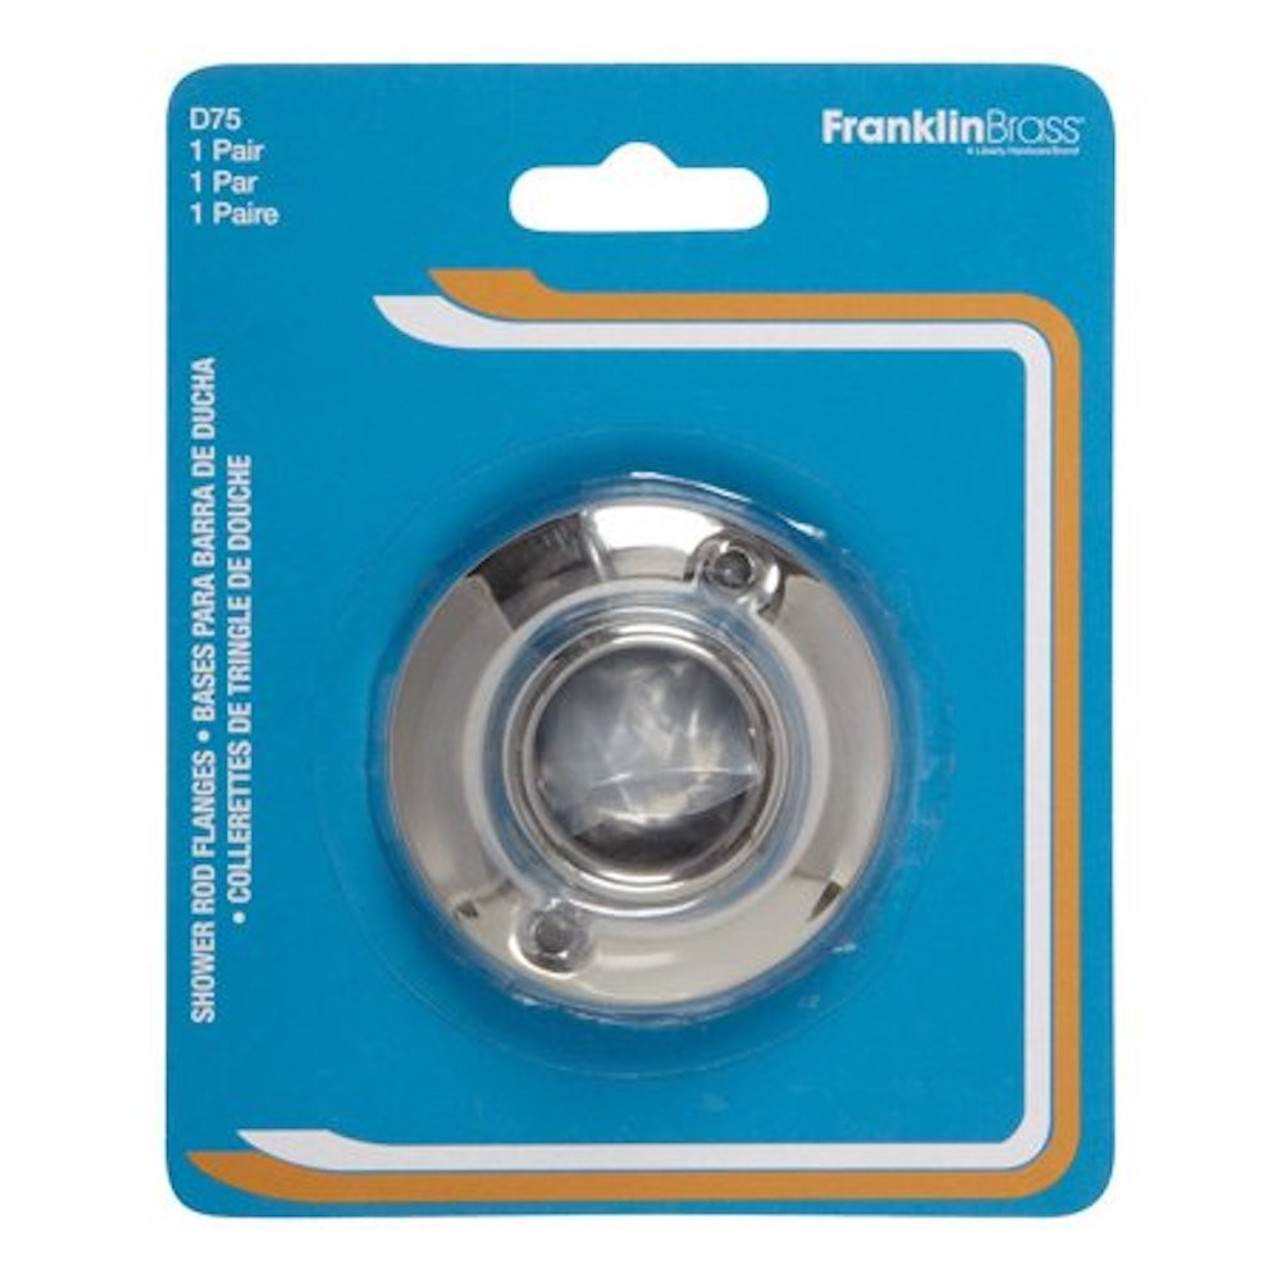 Franklin Brass D75 Shower Curtain Rod Flange For 1 Shower Rods Chrome 1 Pair